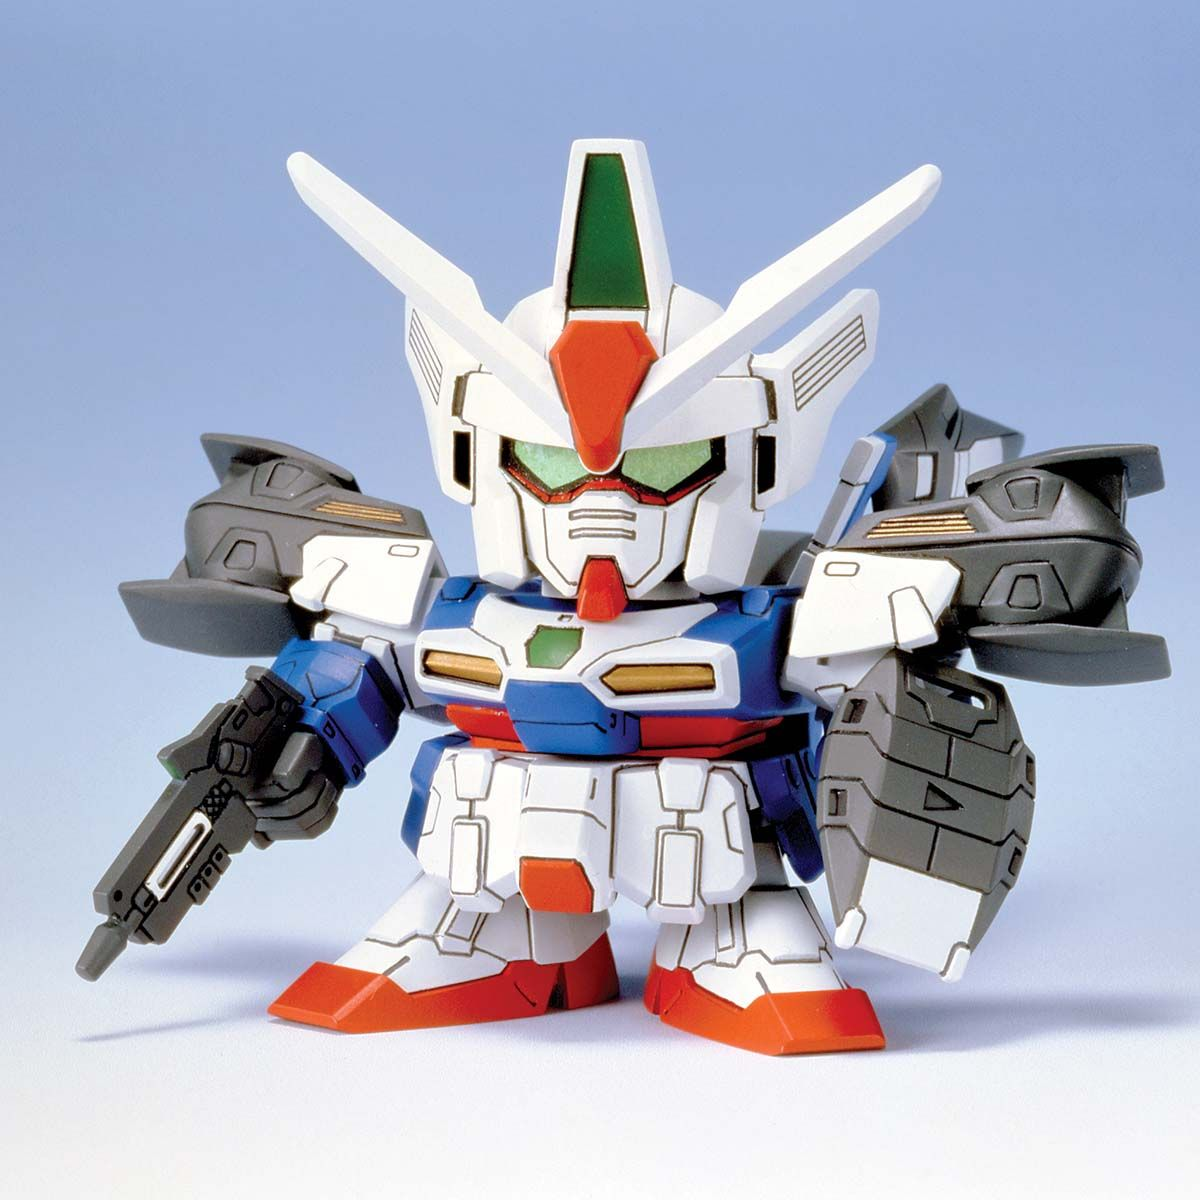 SDガンダム GジェネレーションZERO(GGENERATION-0) 033 OZX-GU01LOB ガンダムジェミナス01 [Gundam Geminass 01] 0075672 5060797